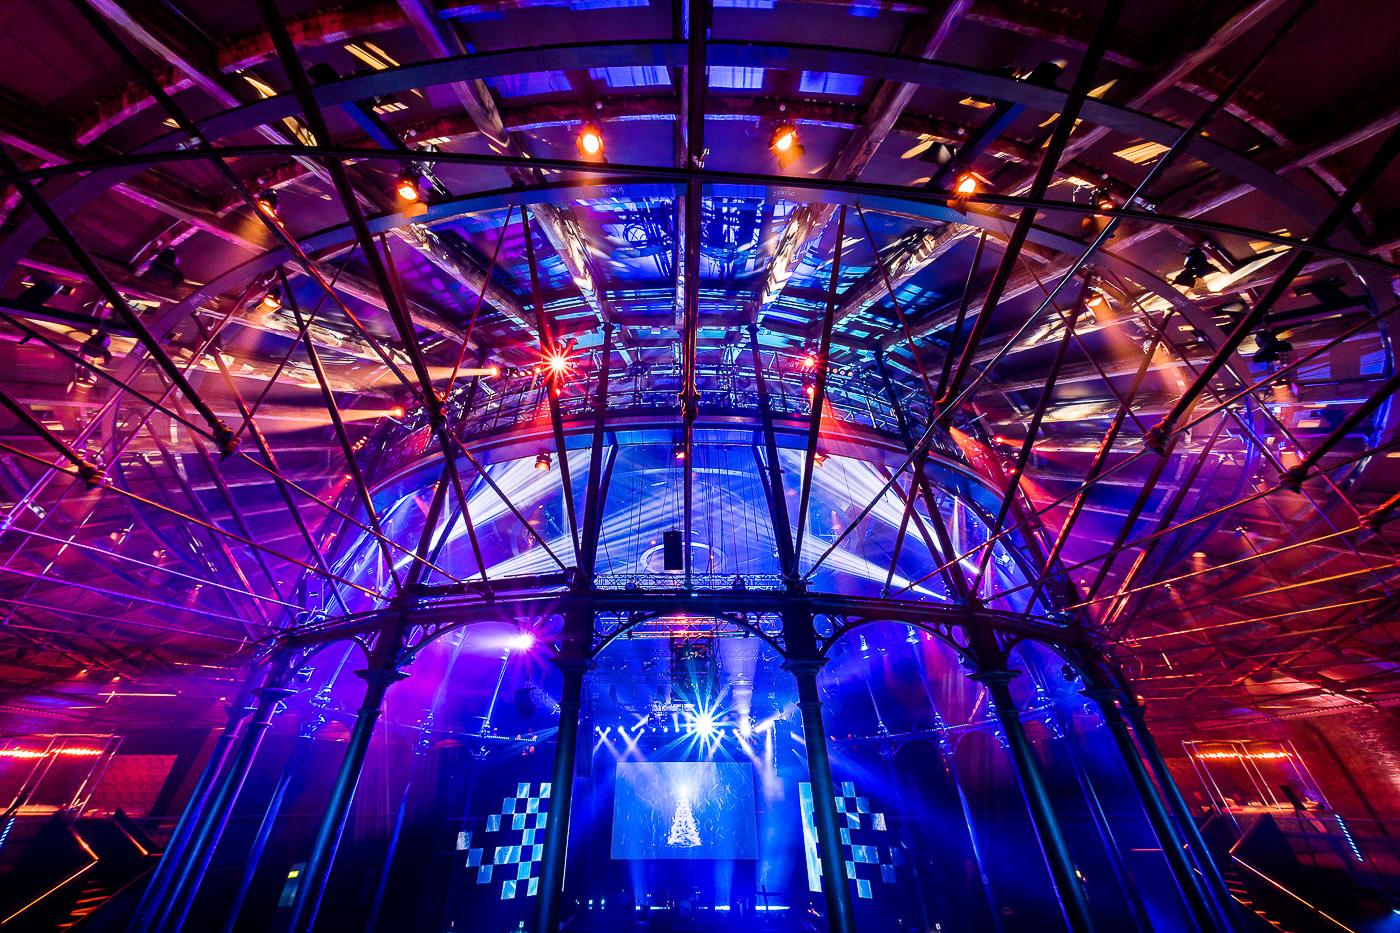 london-event-venues-1008.jpg